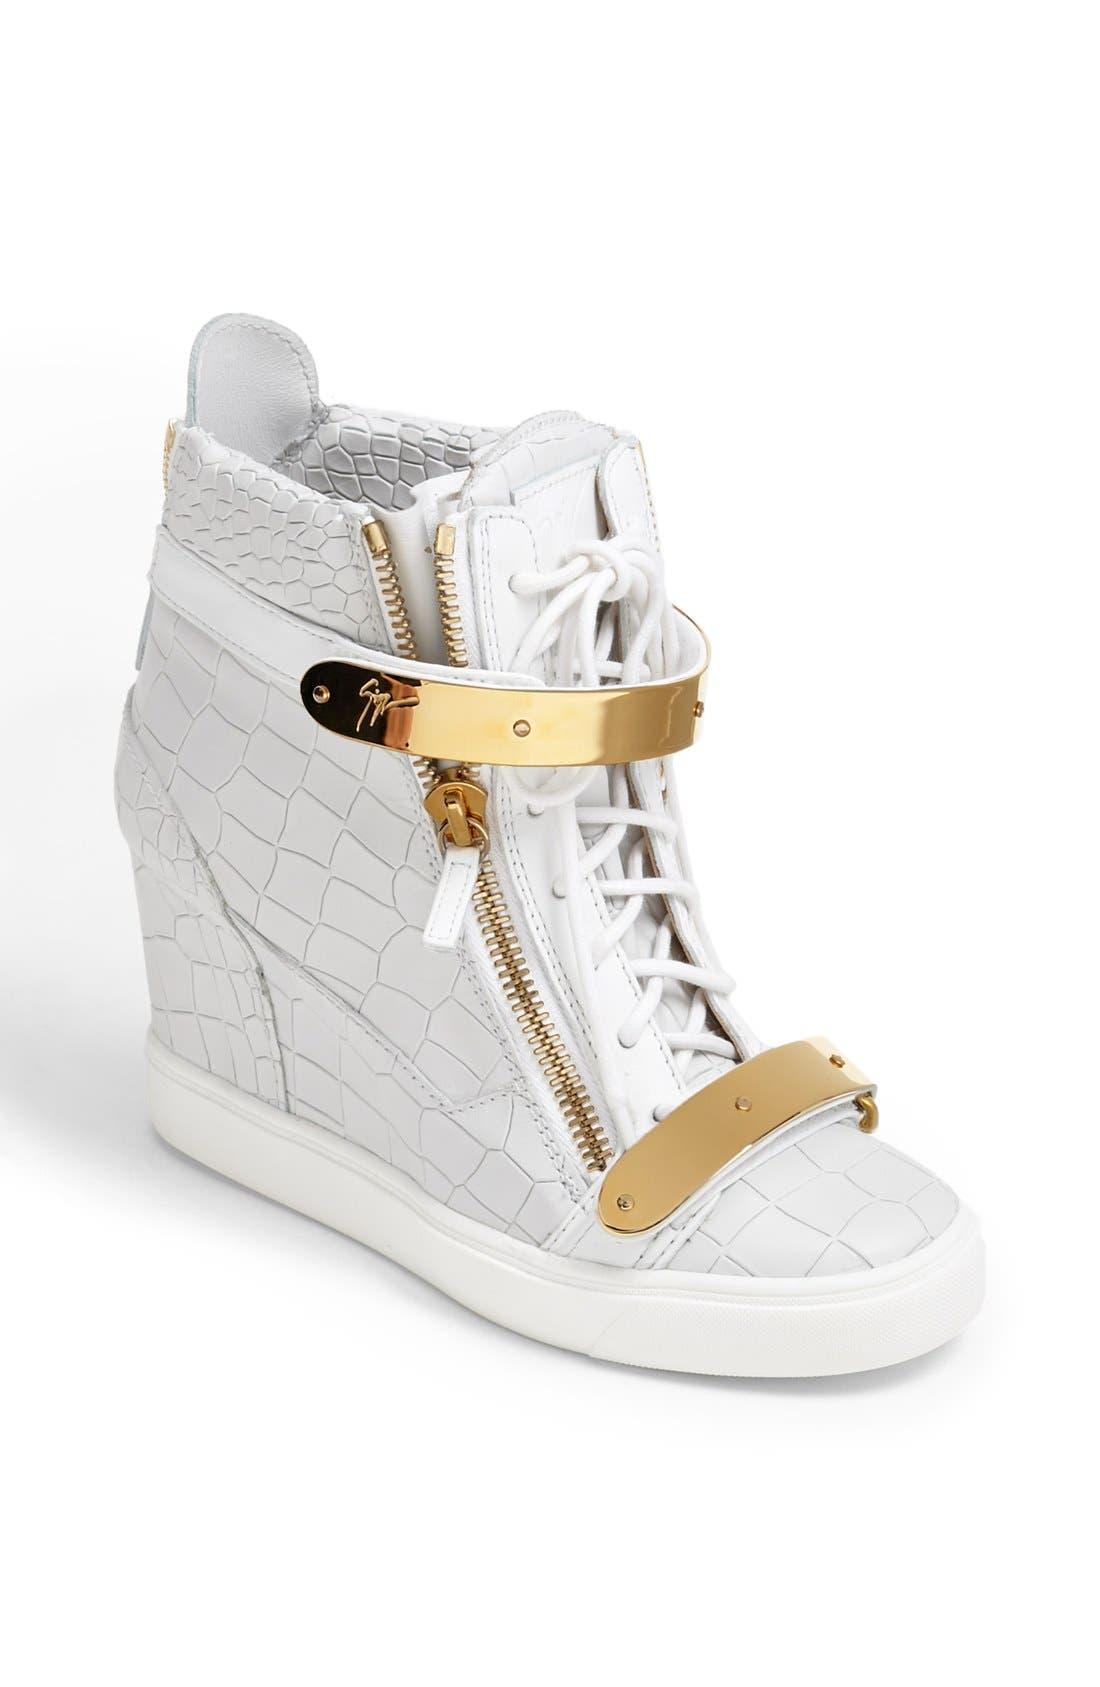 Alternate Image 1 Selected - Giuseppe Zanotti 'Lorenz' High Top Wedge Sneaker